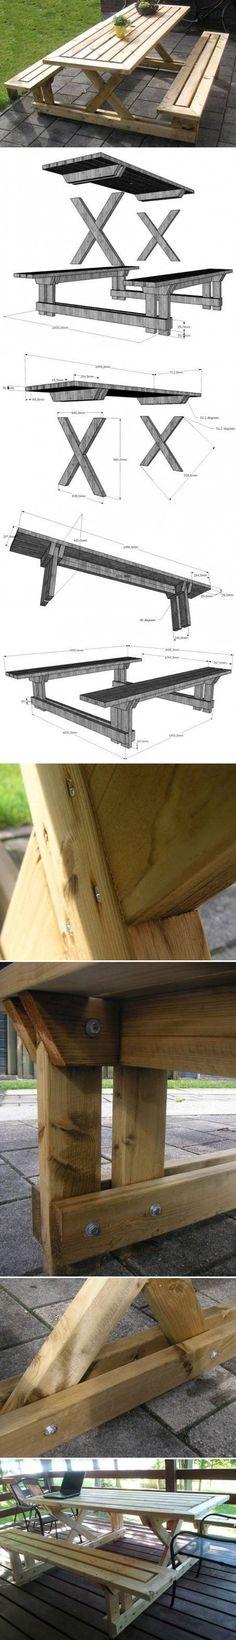 DIY Garden Bench and Table DIY Projects   UsefulDIY.com